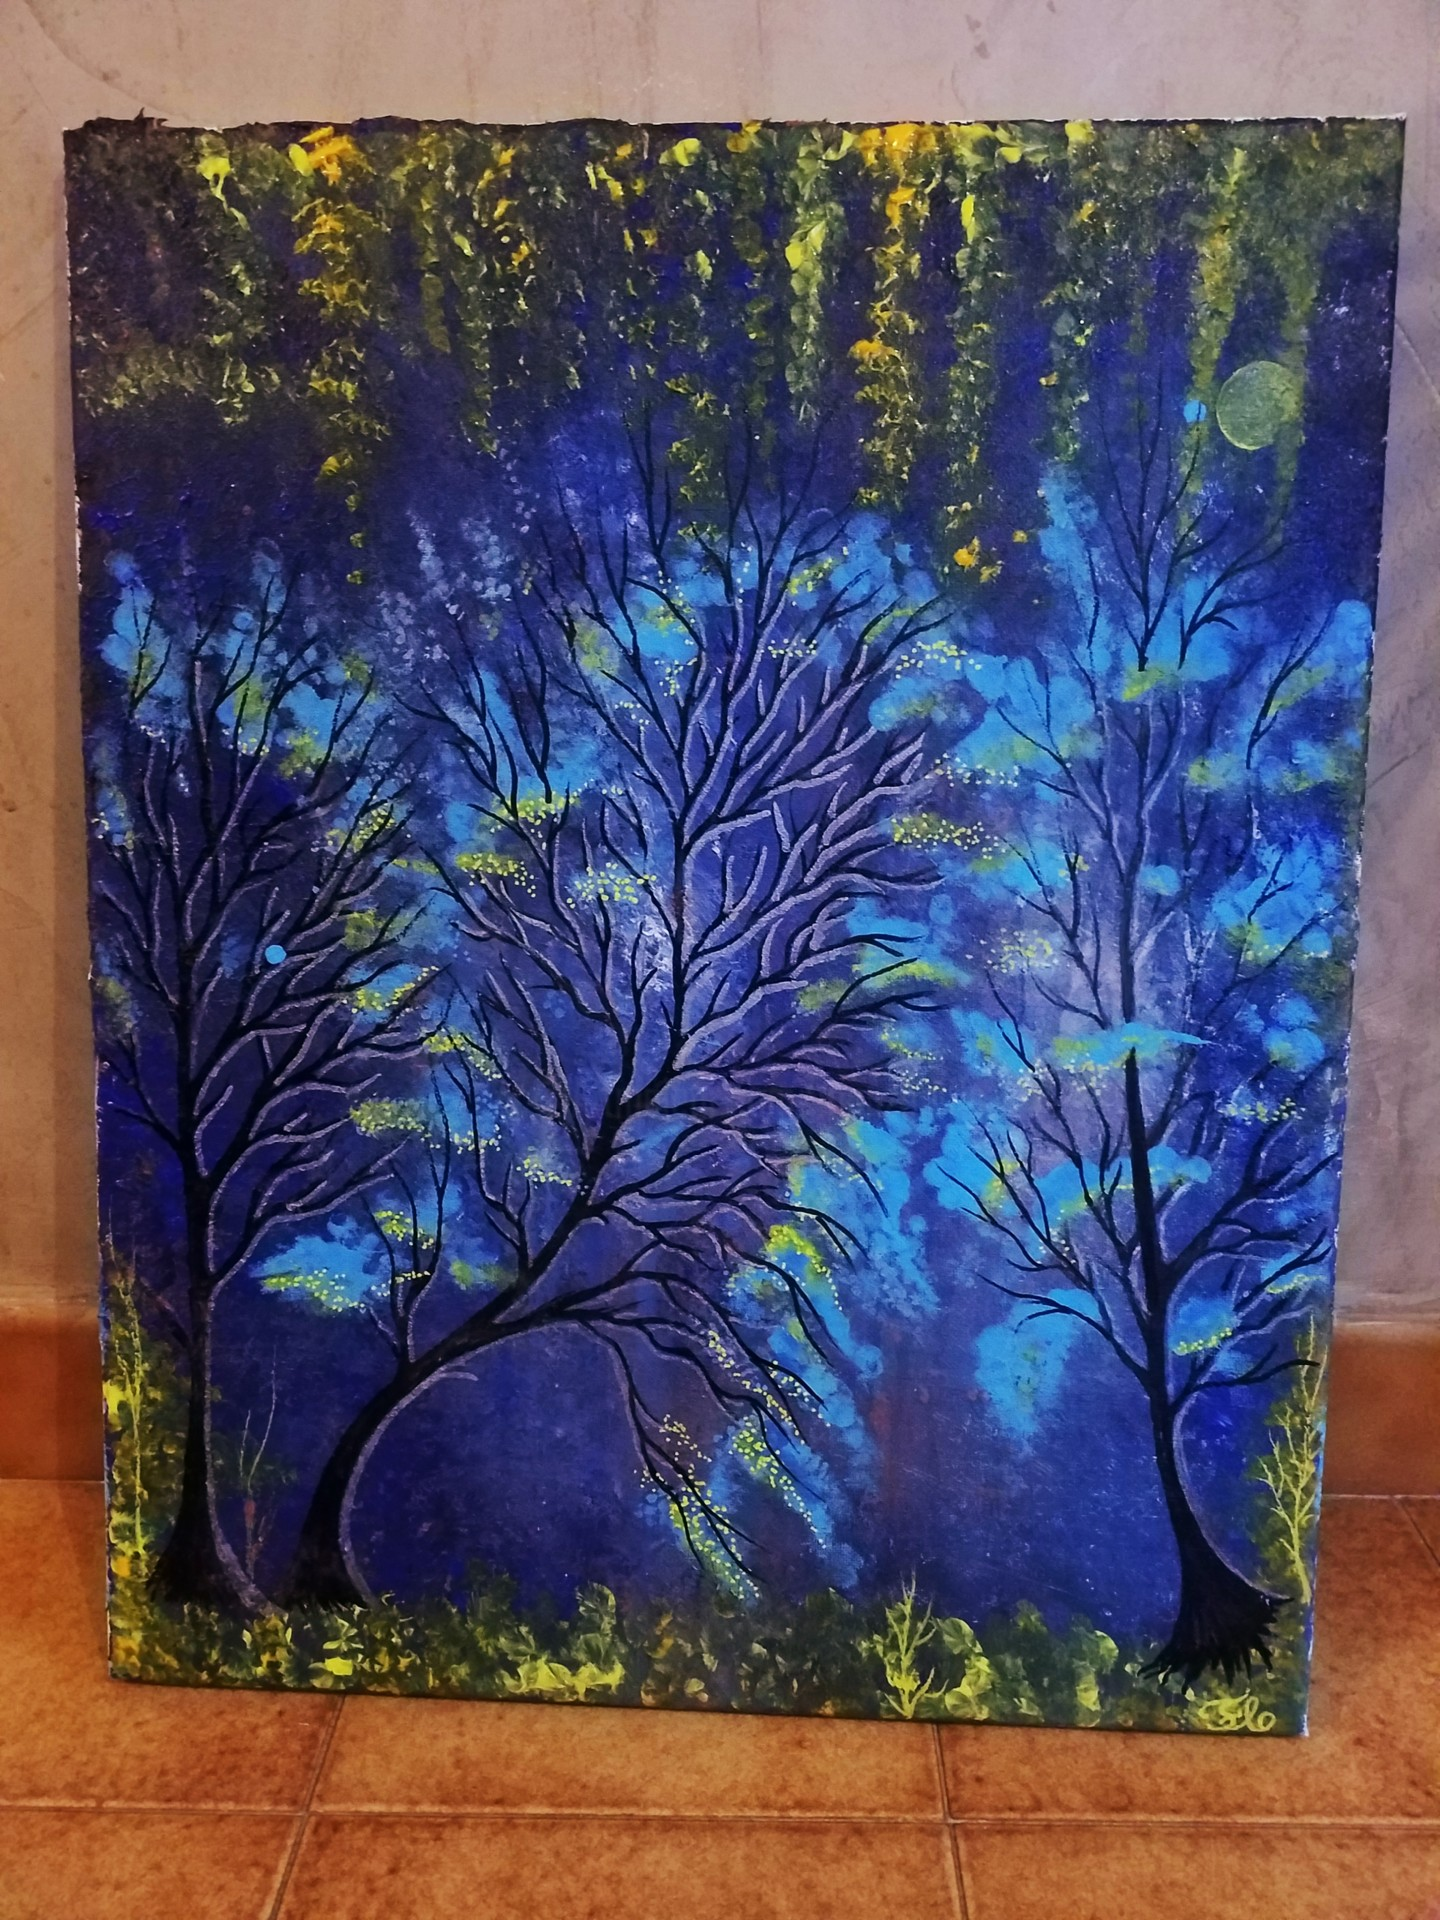 Florence Castelli  flofloyd - La forêt en ébullition